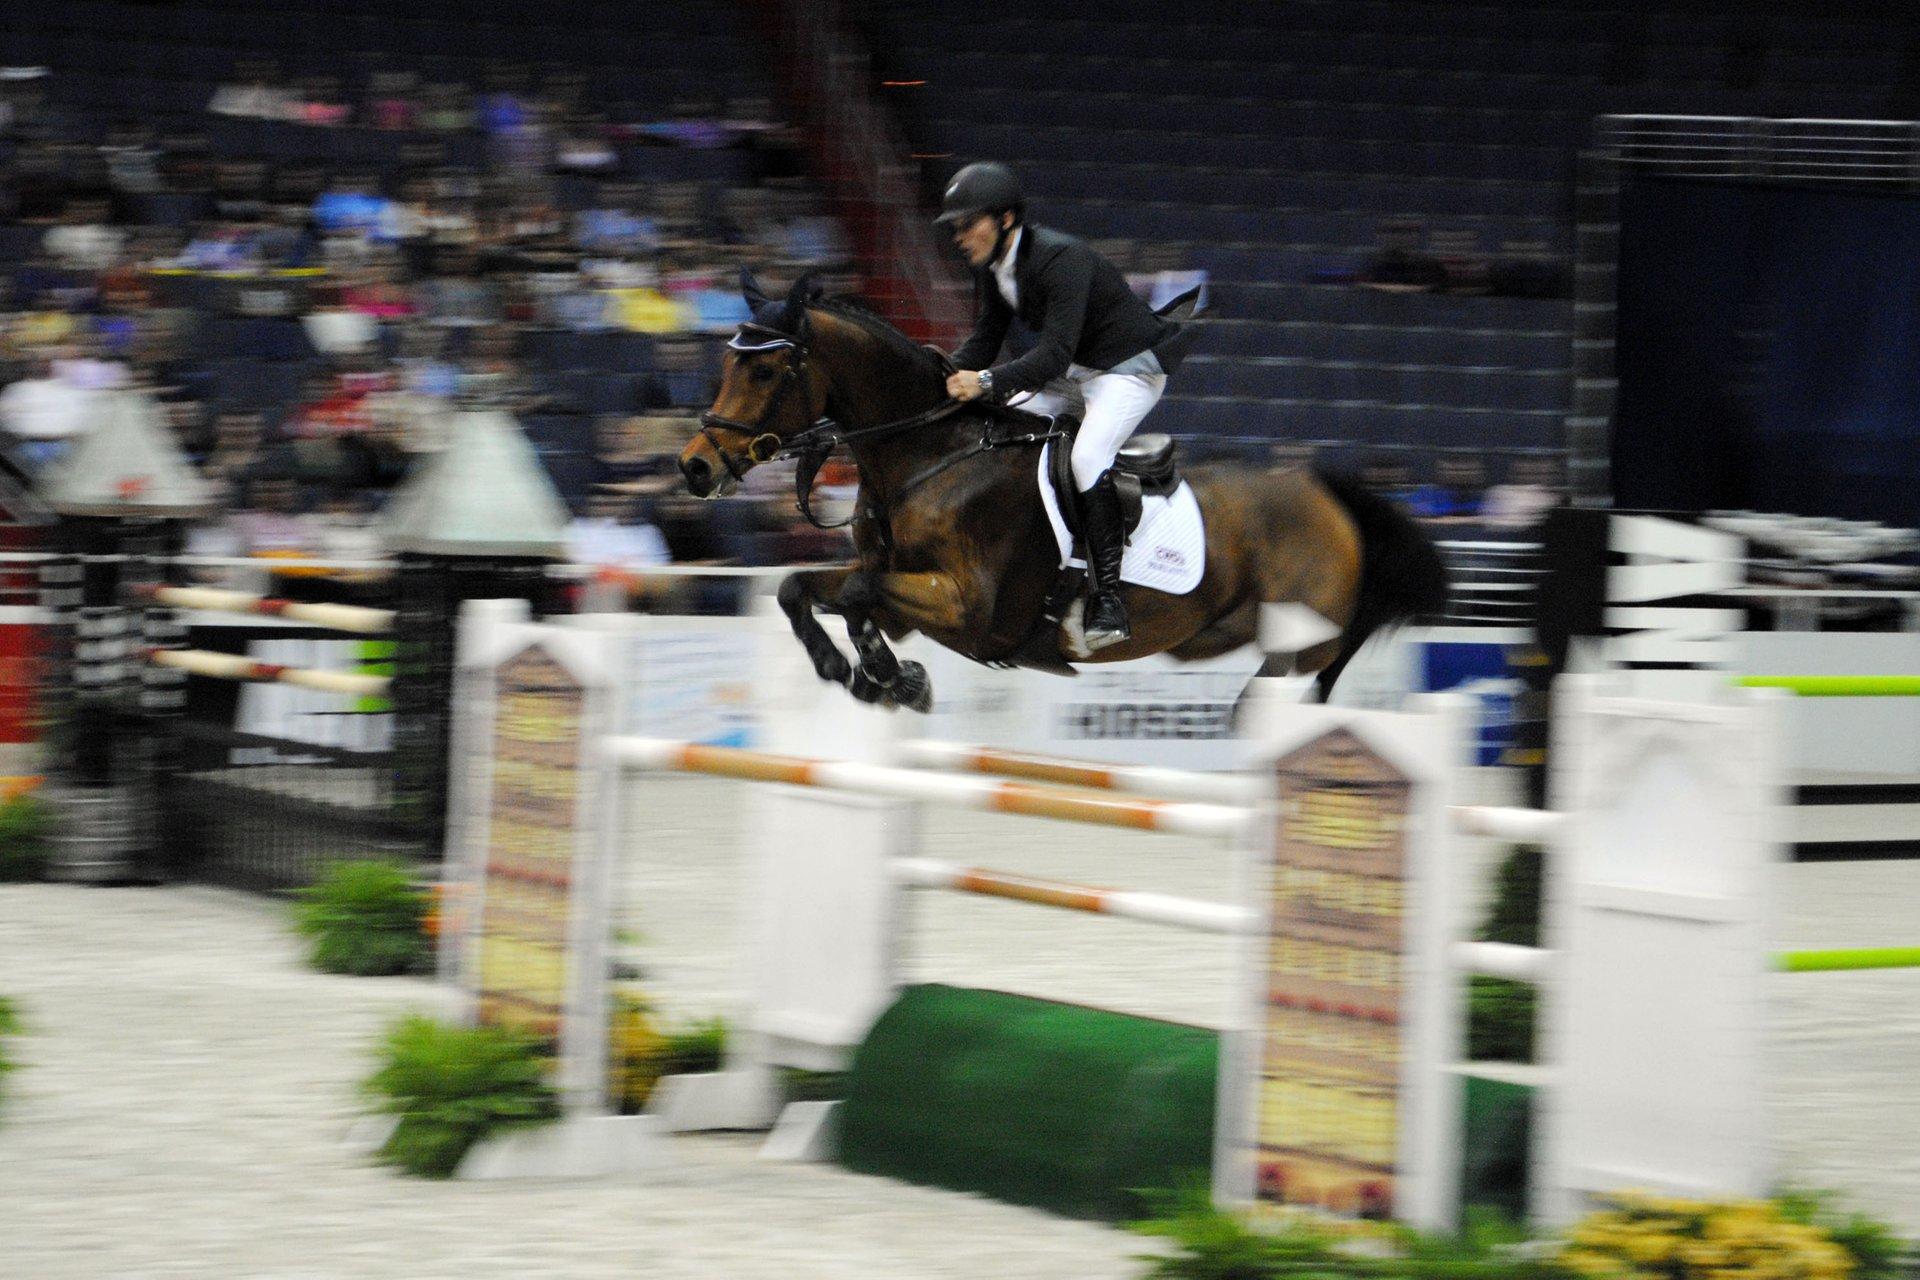 Washington International Horse Show in Washington, D.C. 2020 - Best Time